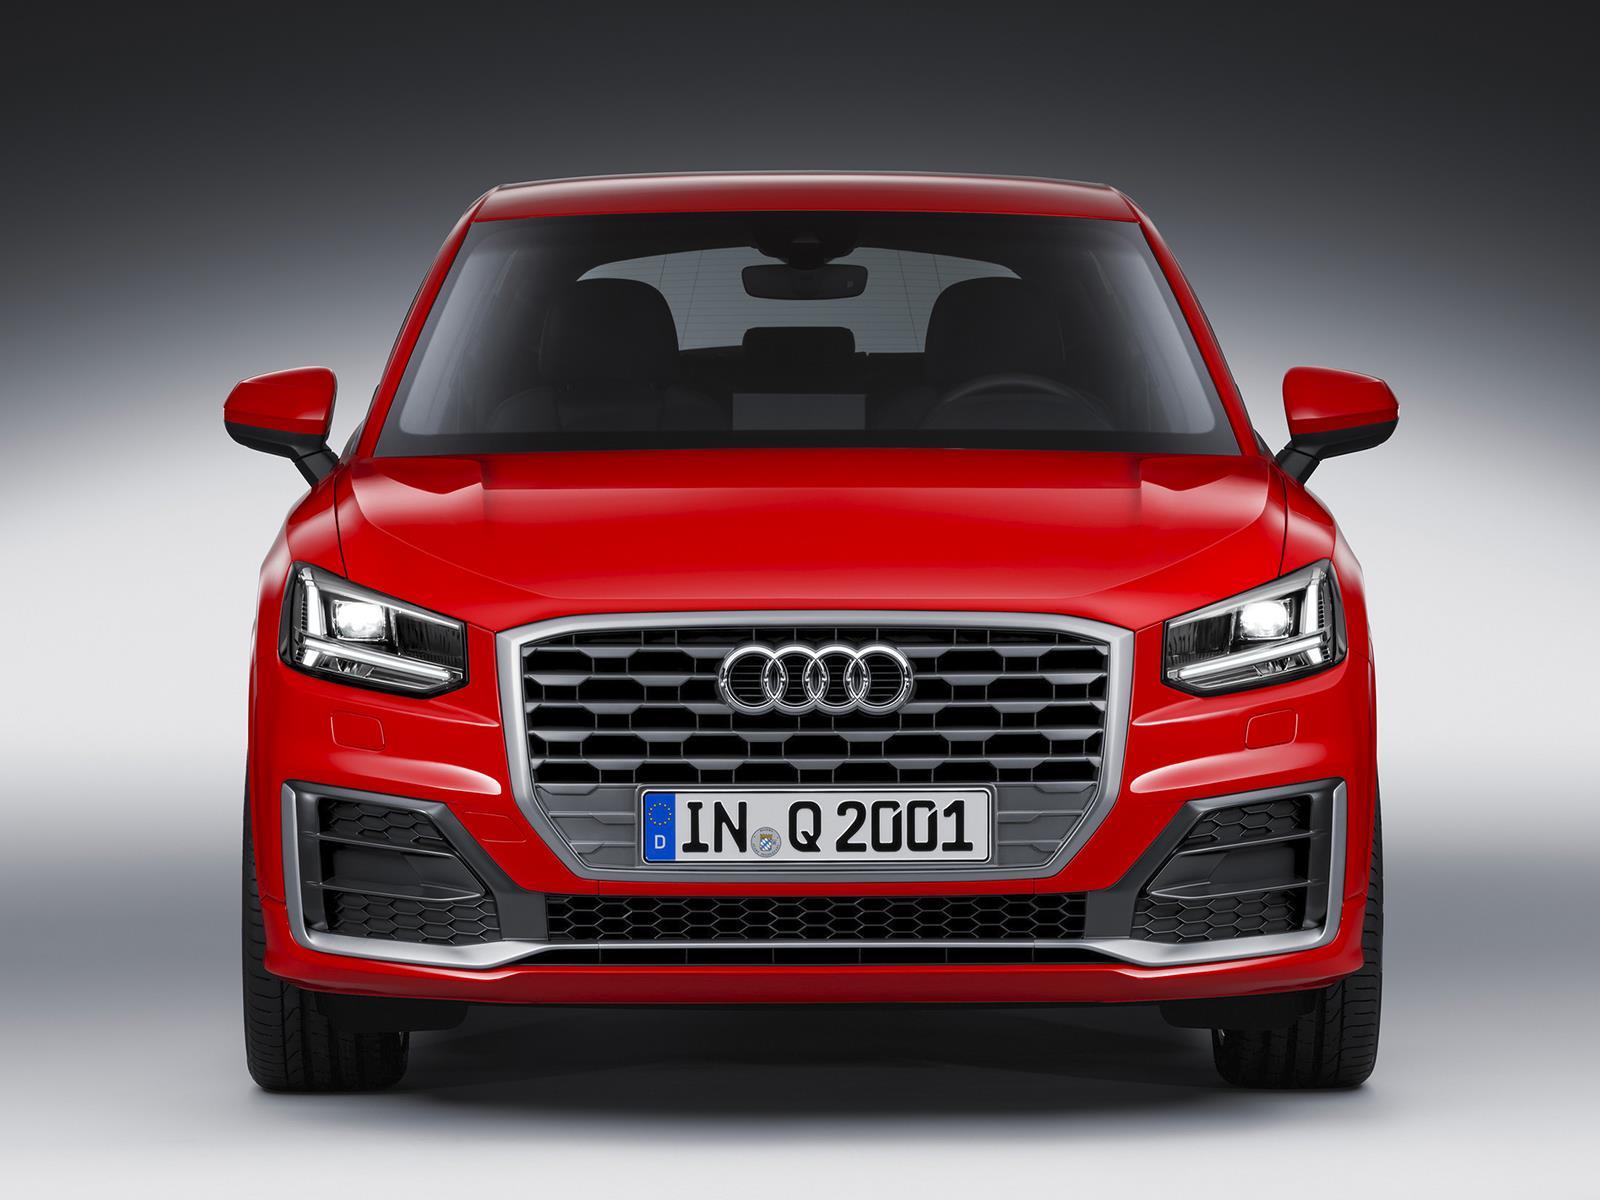 Autoshow De Ginebra 2016 Audi Q2 2017 El Nuevo